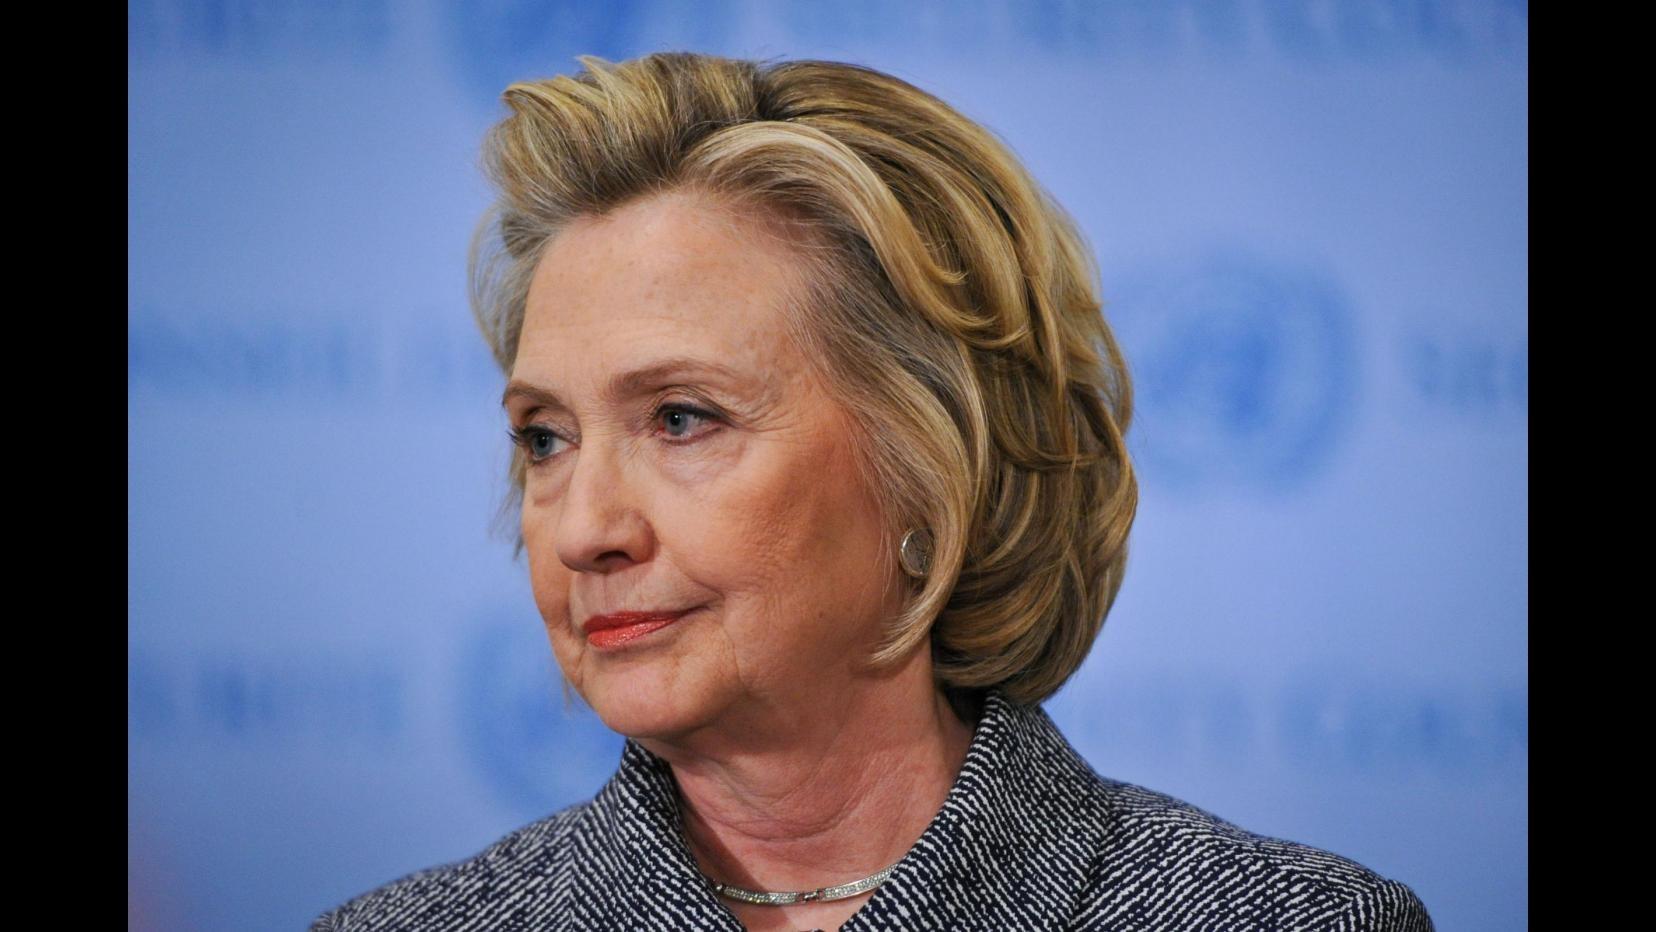 Poster, parodie e spot: la campagna Gop contro Clinton presidente